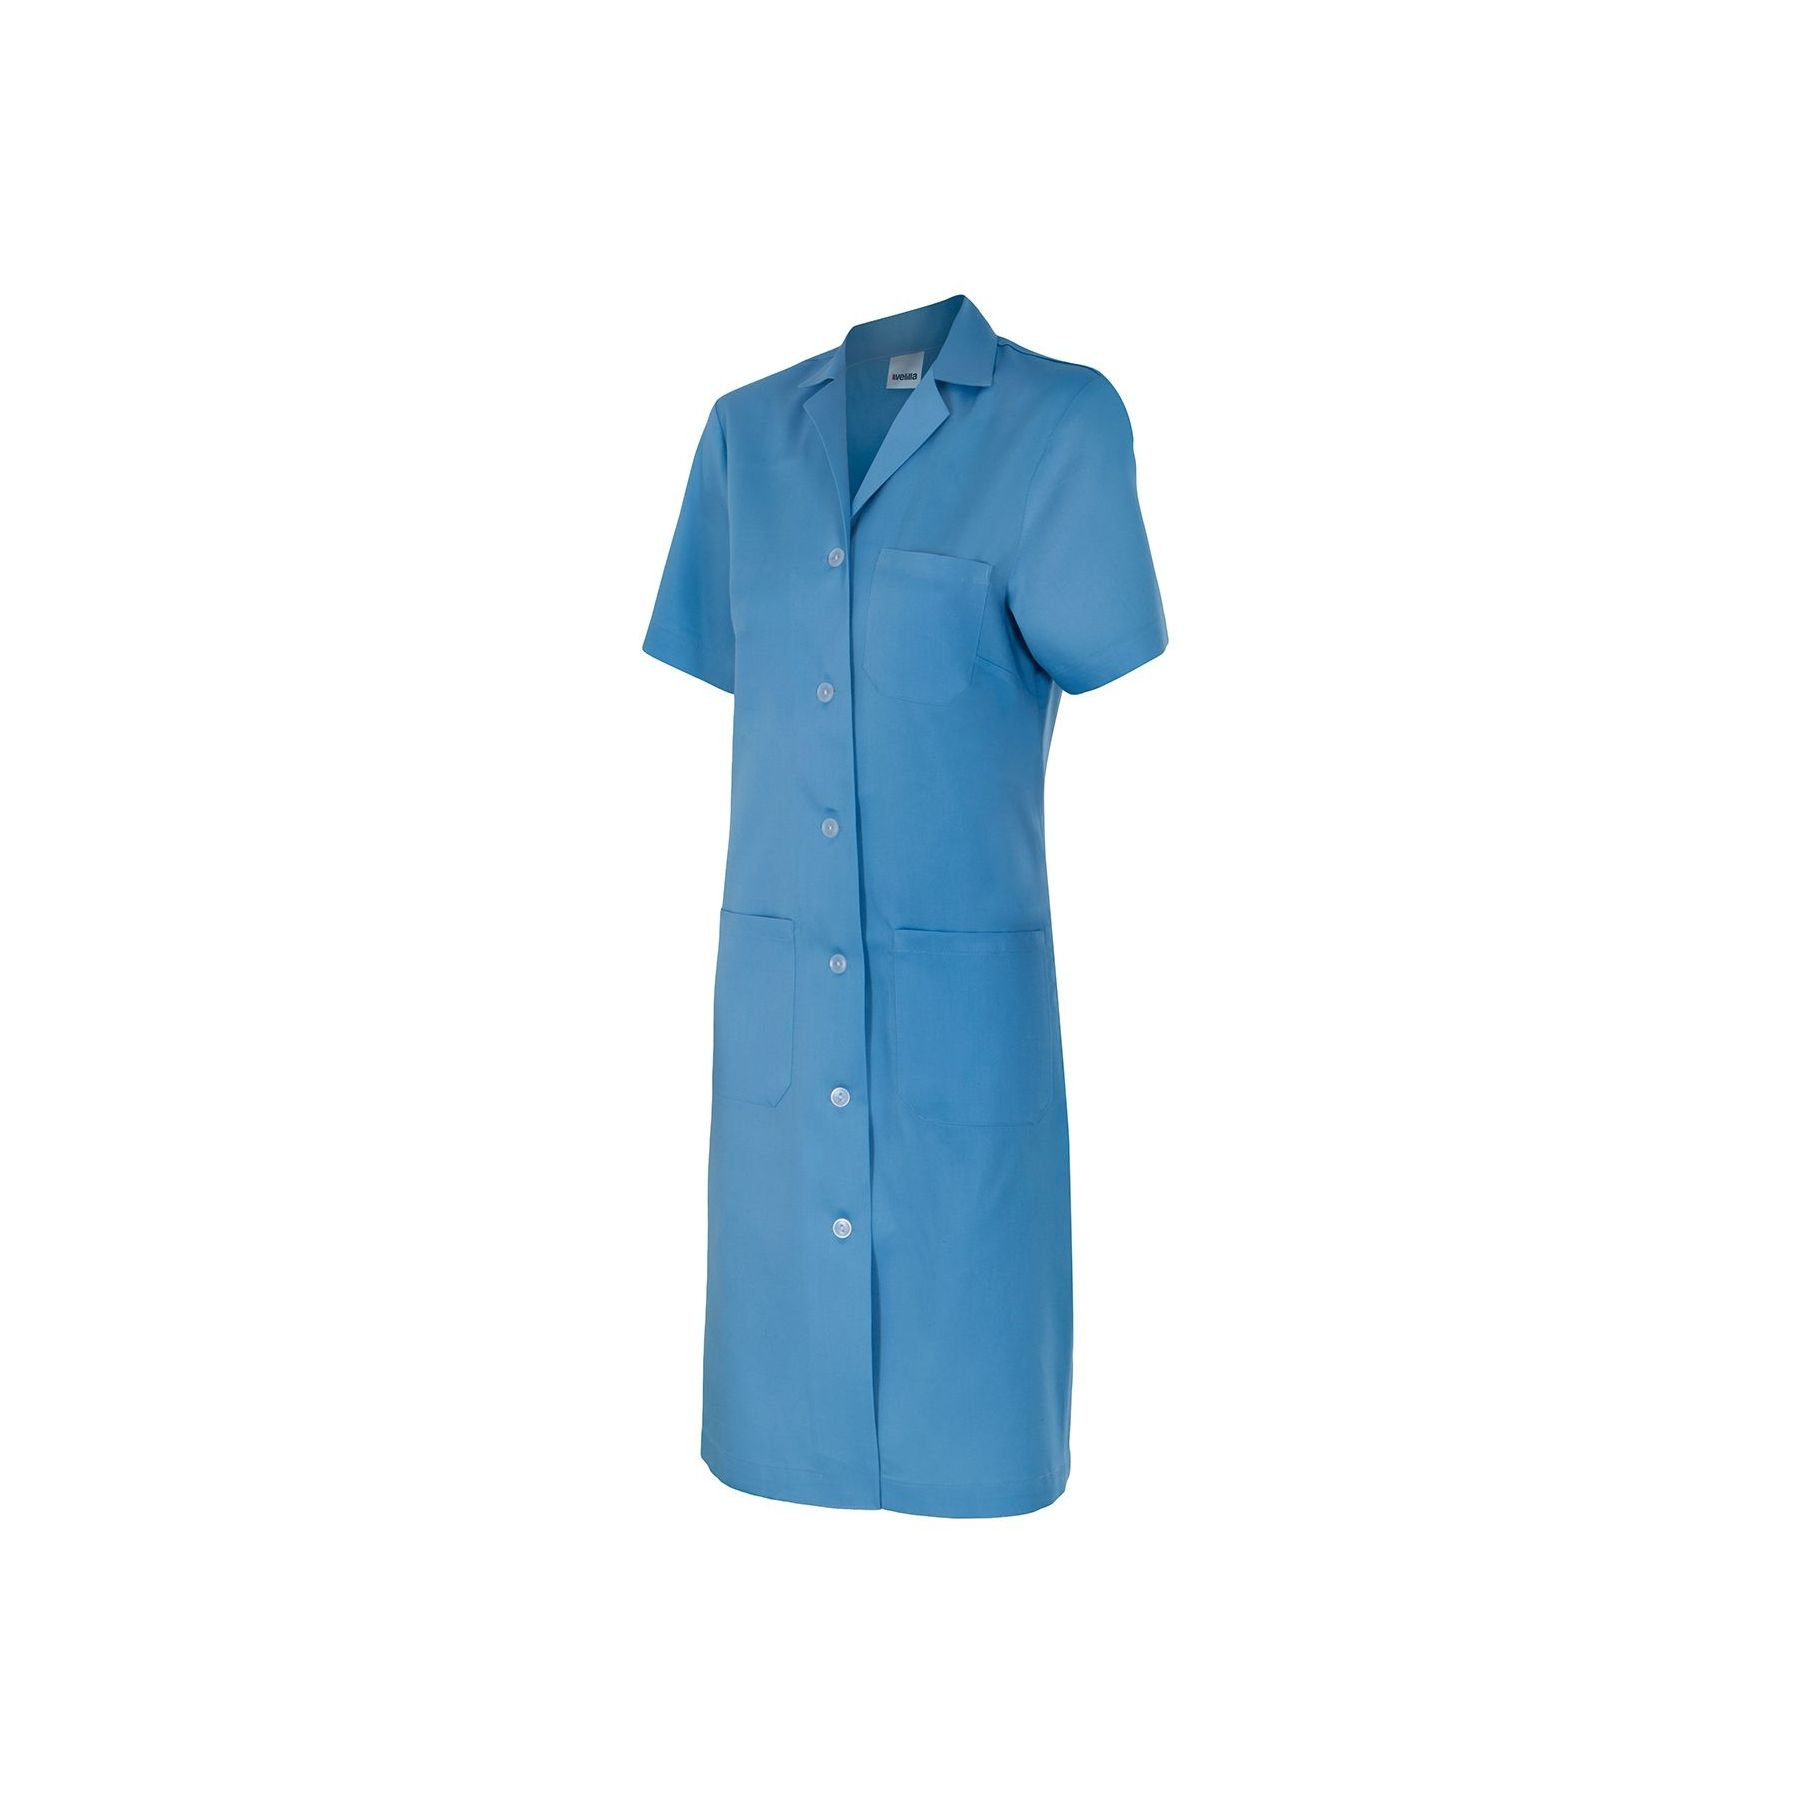 Bata mujer manga corta (ref: 907, varias tallas disponibles)